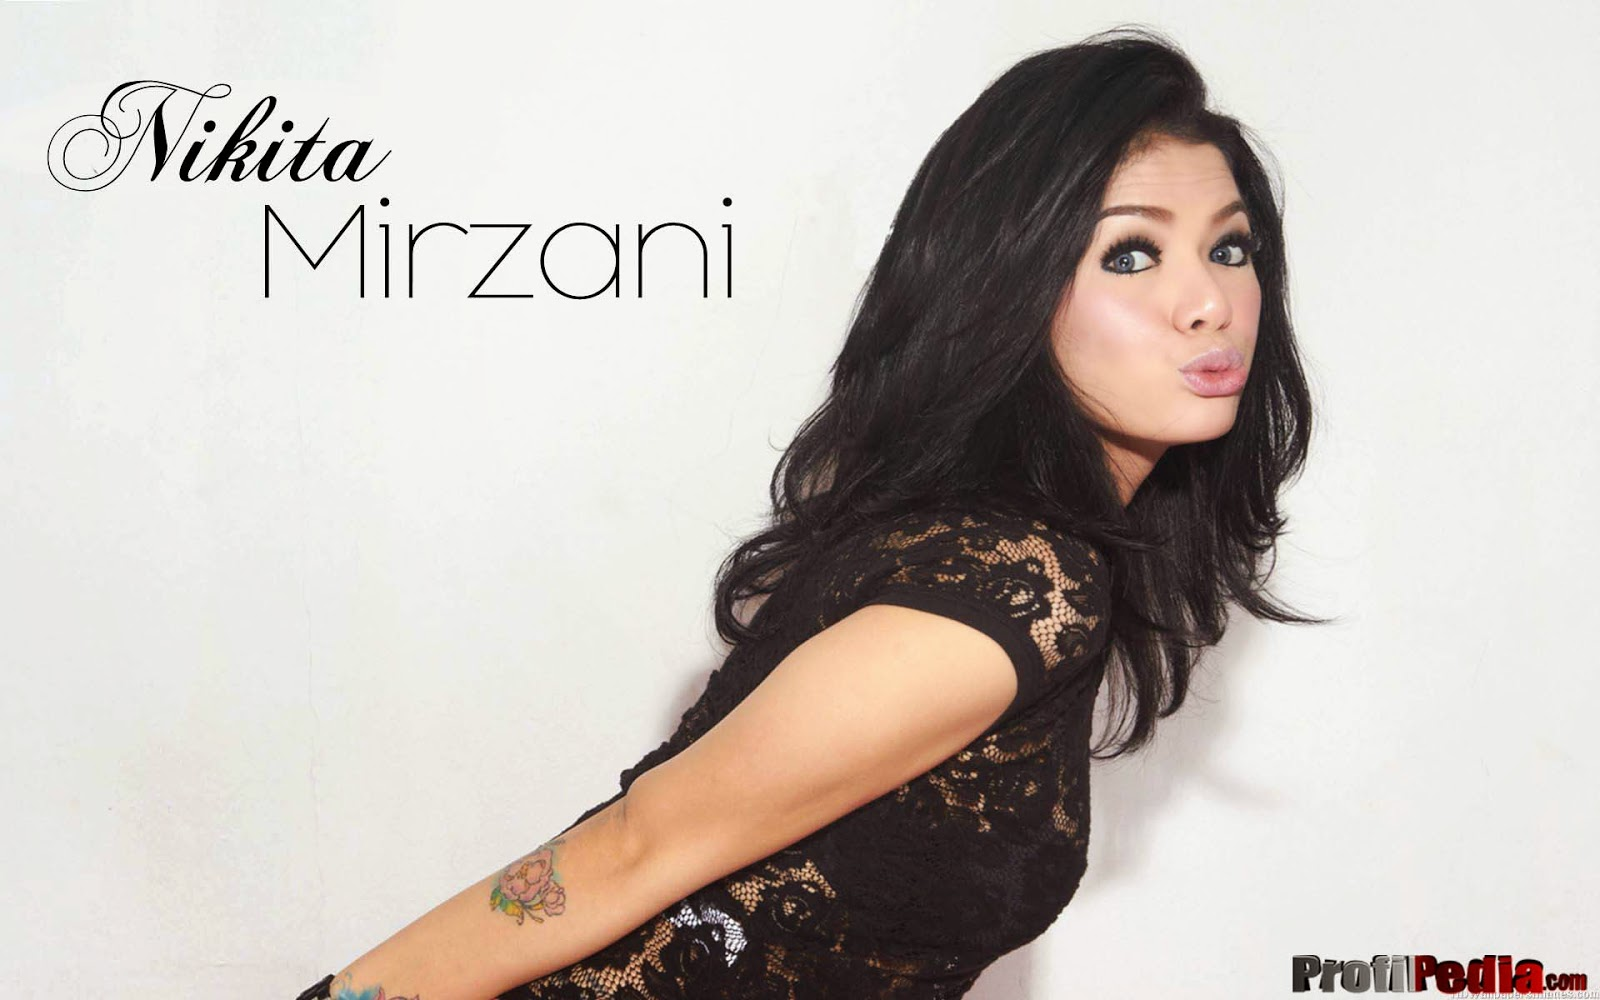 Wallpaper Nikita Mirzani